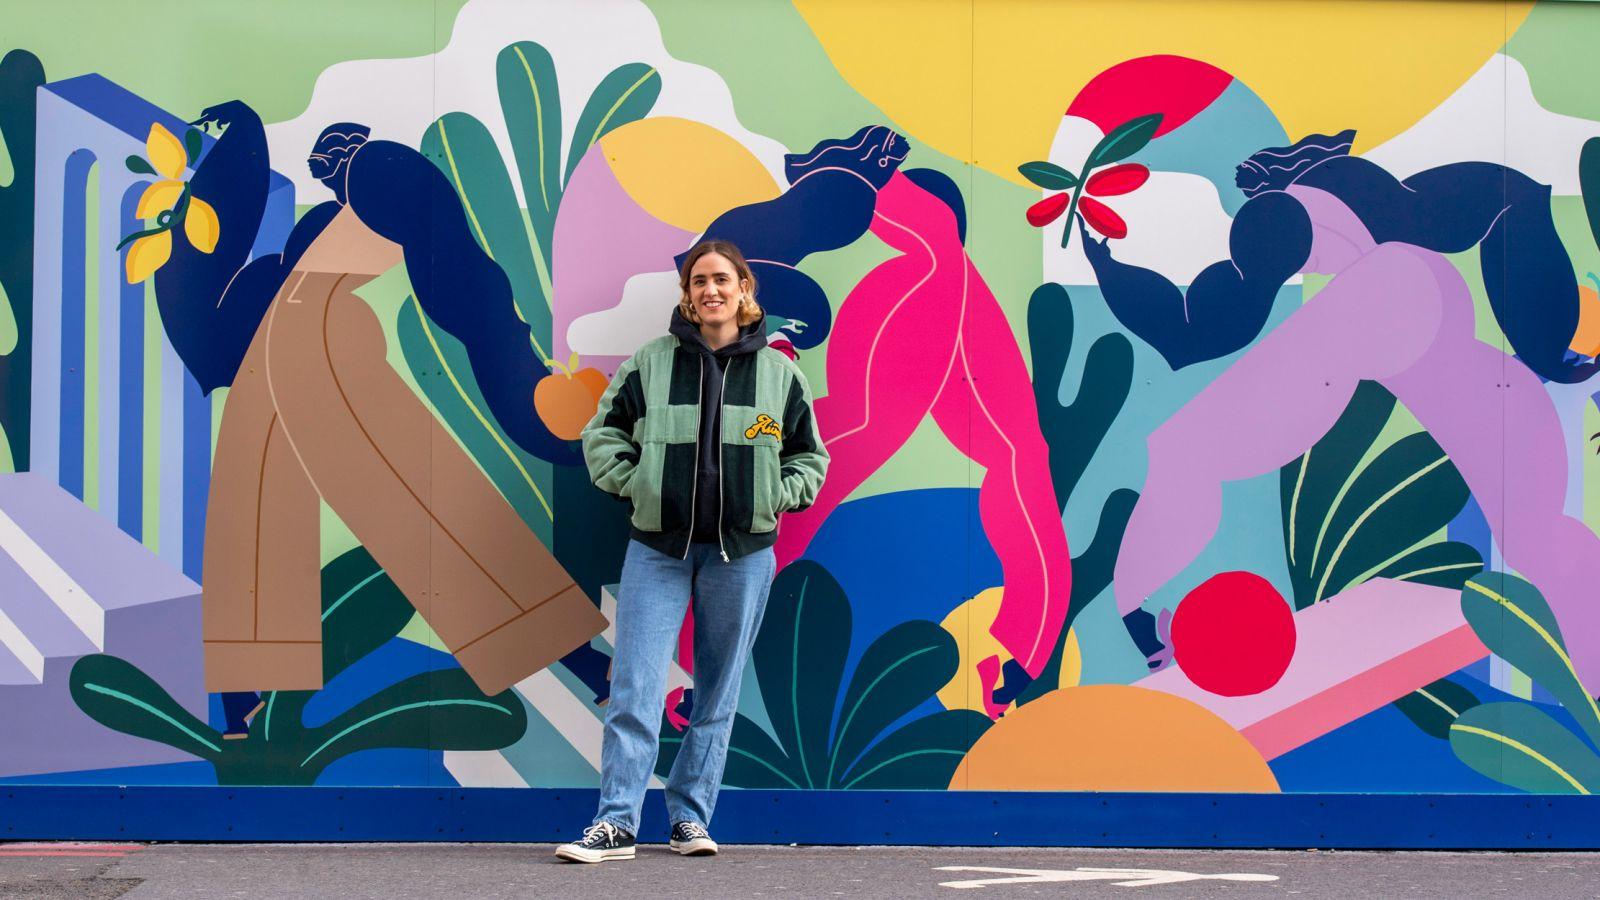 Paddington Square: Η καλλιτέχνης Kelly Anna «ντύνει» με τοιχογραφία της ένα από τα πιο κεντρικά σημεία του Λονδίνου